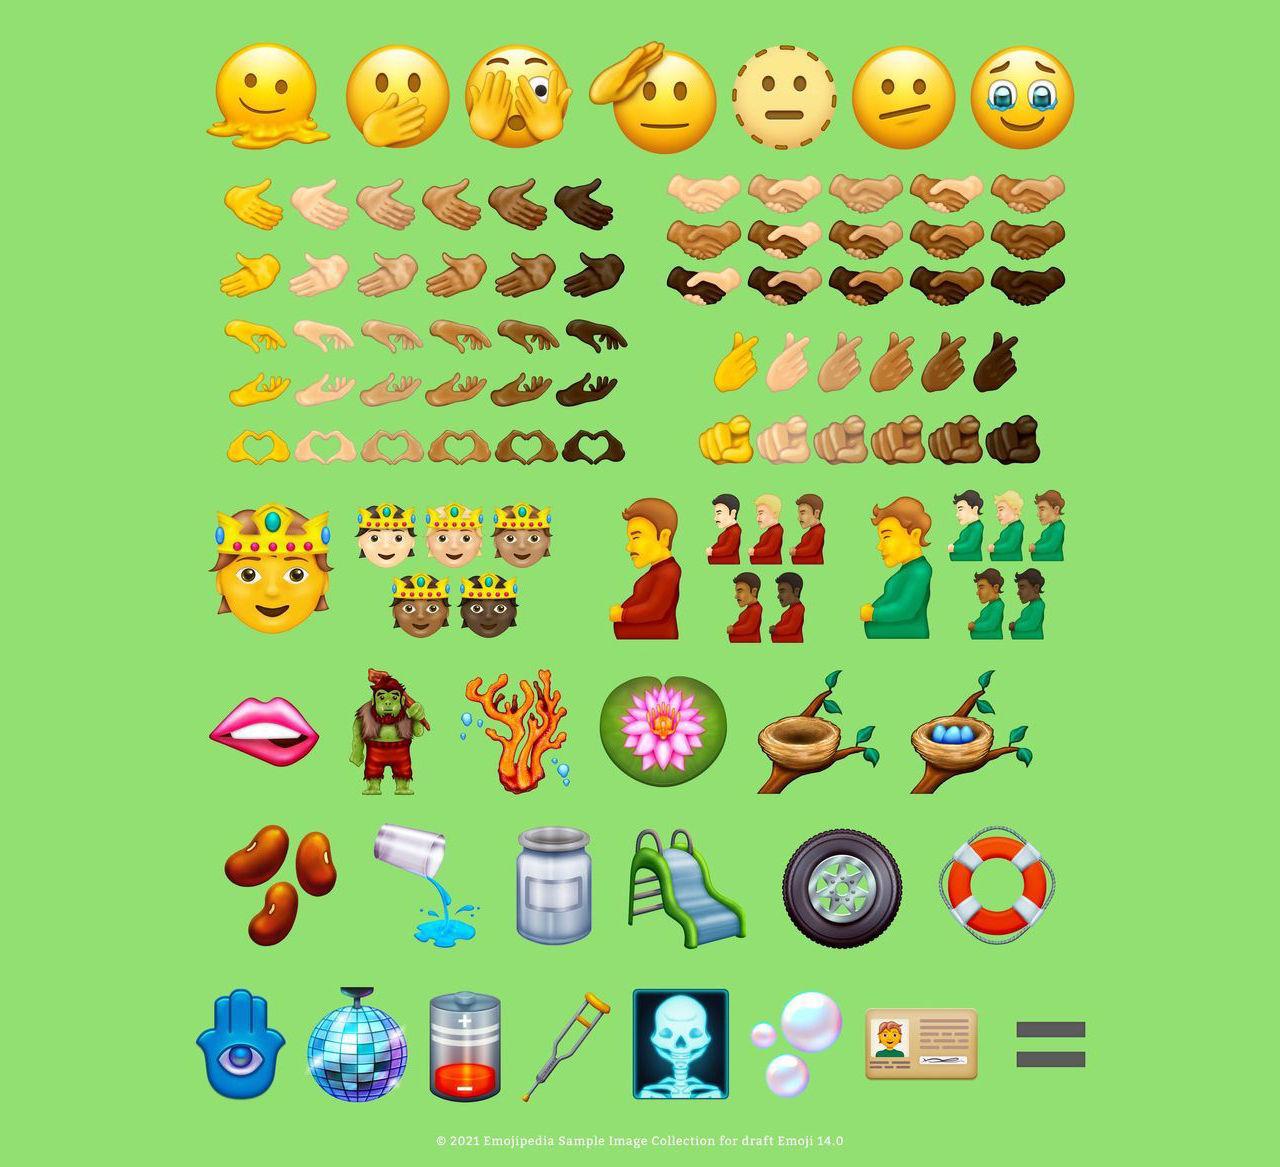 37 nya emojis på ingång